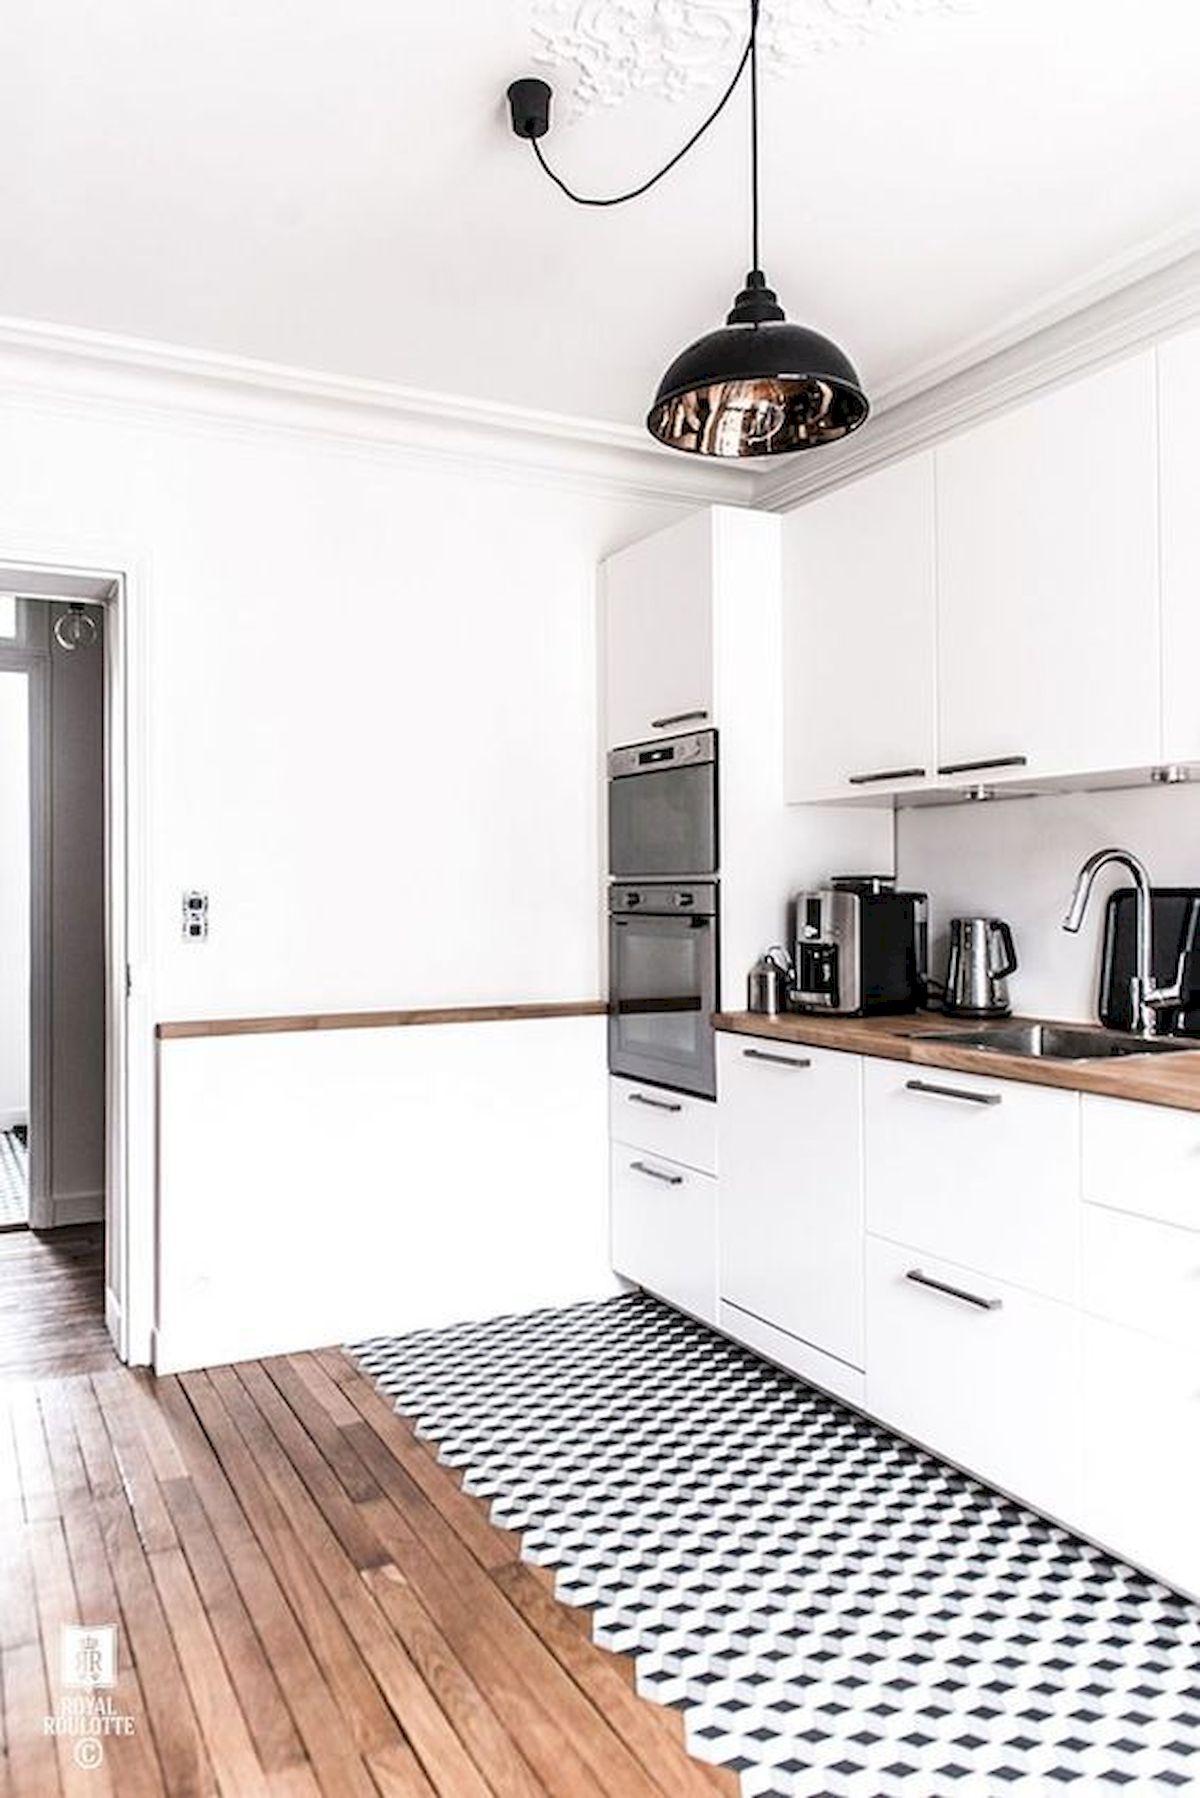 40 Best Tile Flooring Designs Ideas For Modern Kitchen (13)